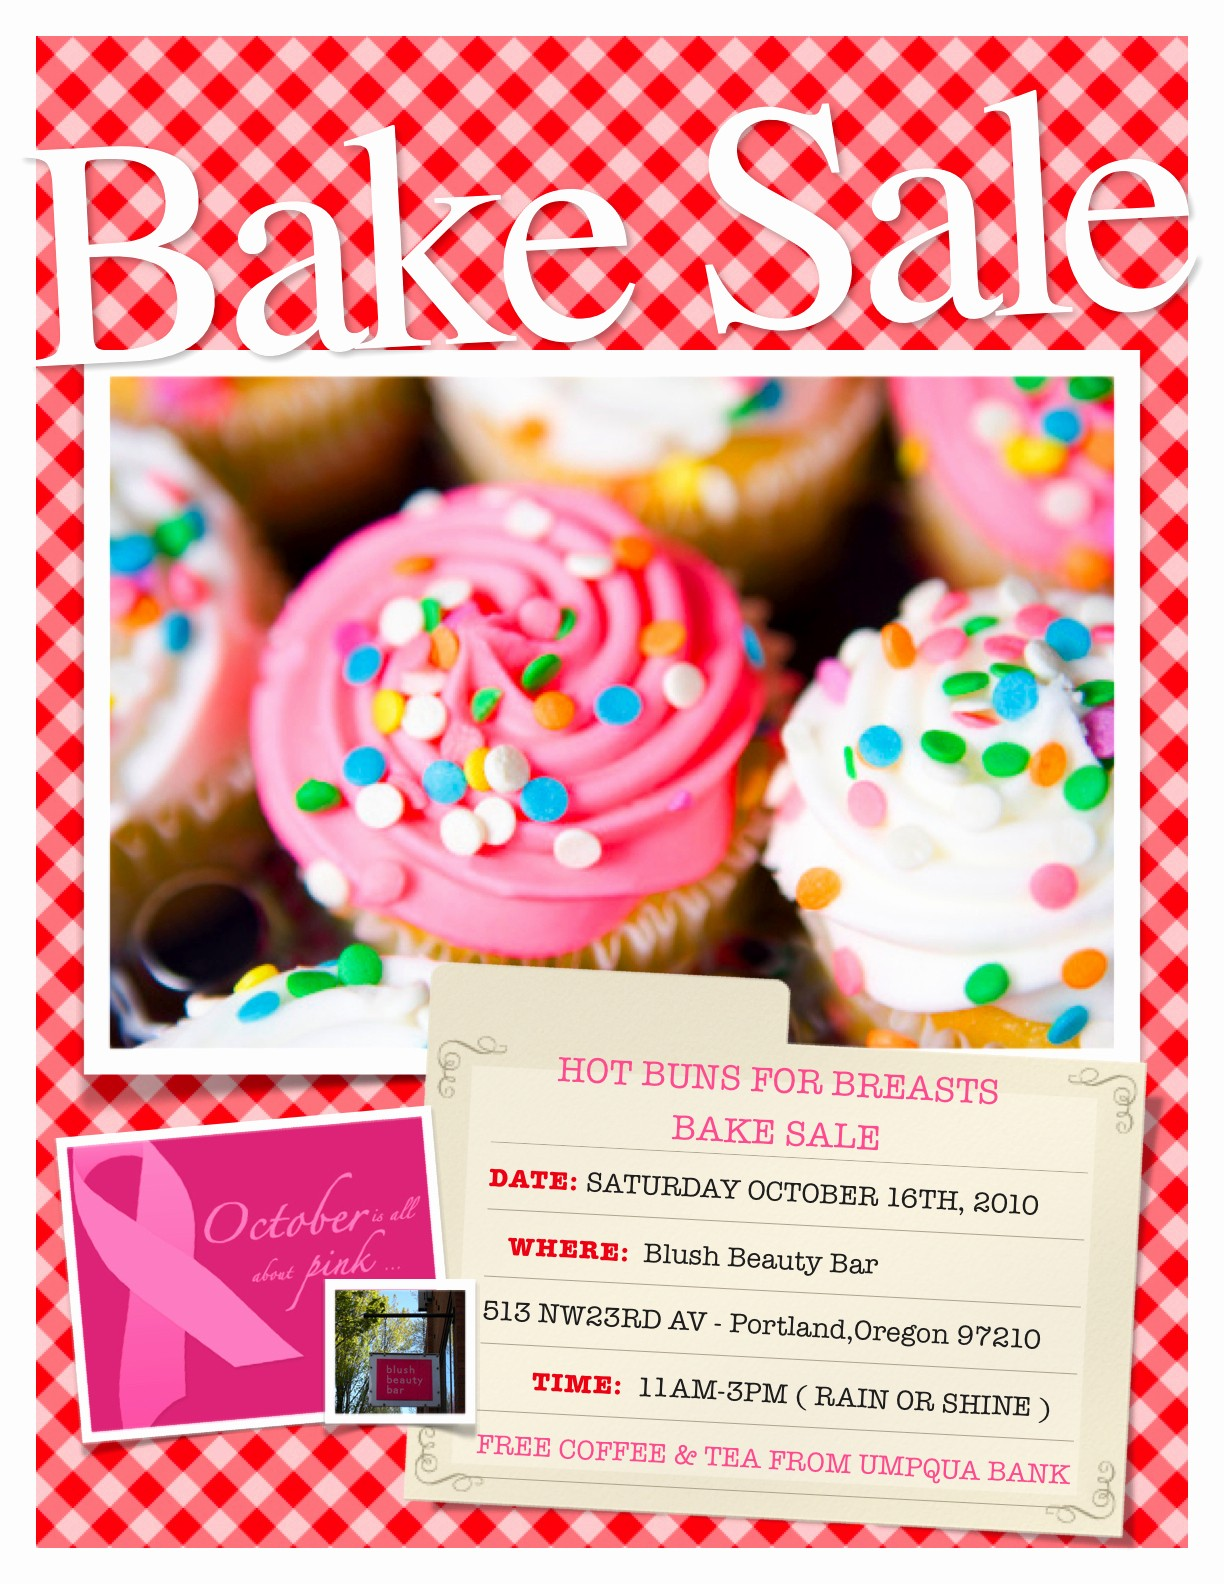 Bake Sale Flyer Template Microsoft Lovely Hot Buns for Breats Bake Sale